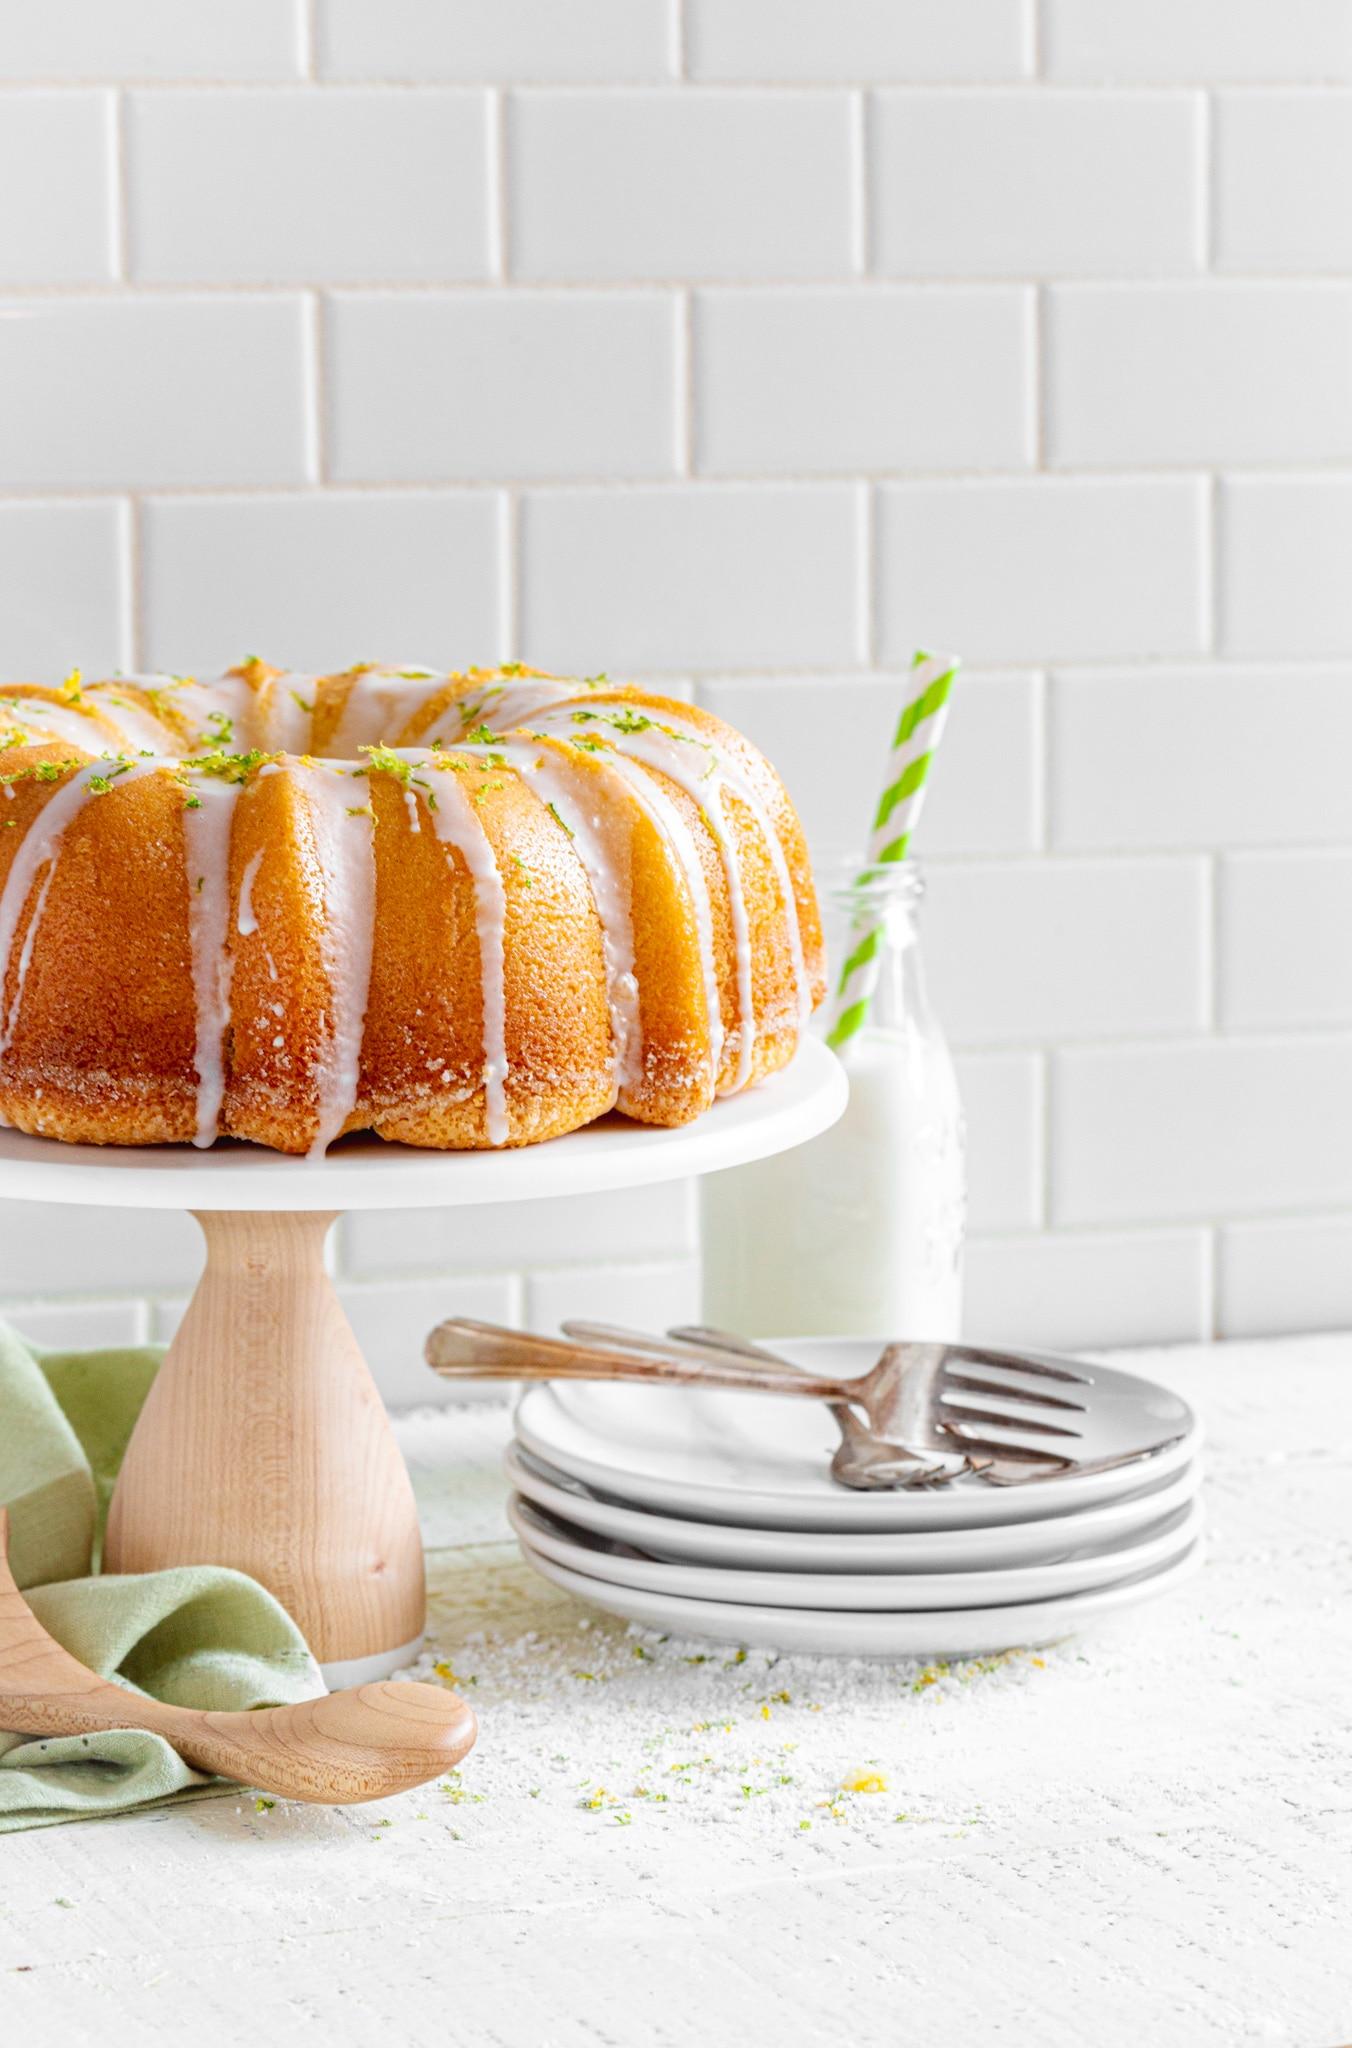 Lemon Bundt Cake on a stand with dessert plates and forks.